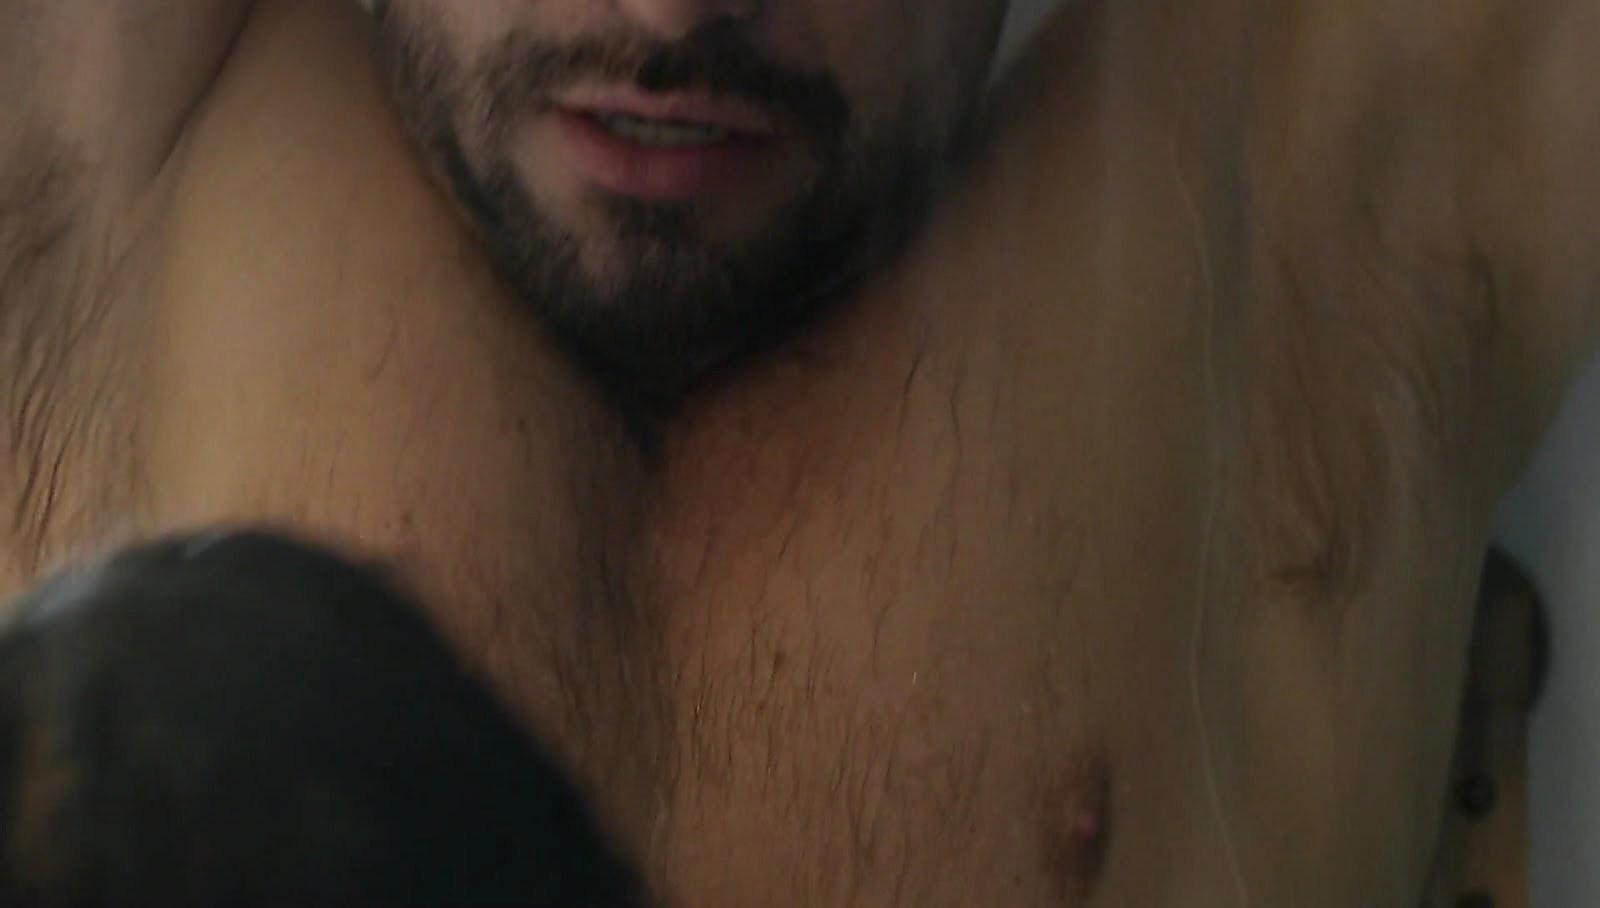 Rafael Amaya sexy shirtless scene May 26, 2018, 12pm